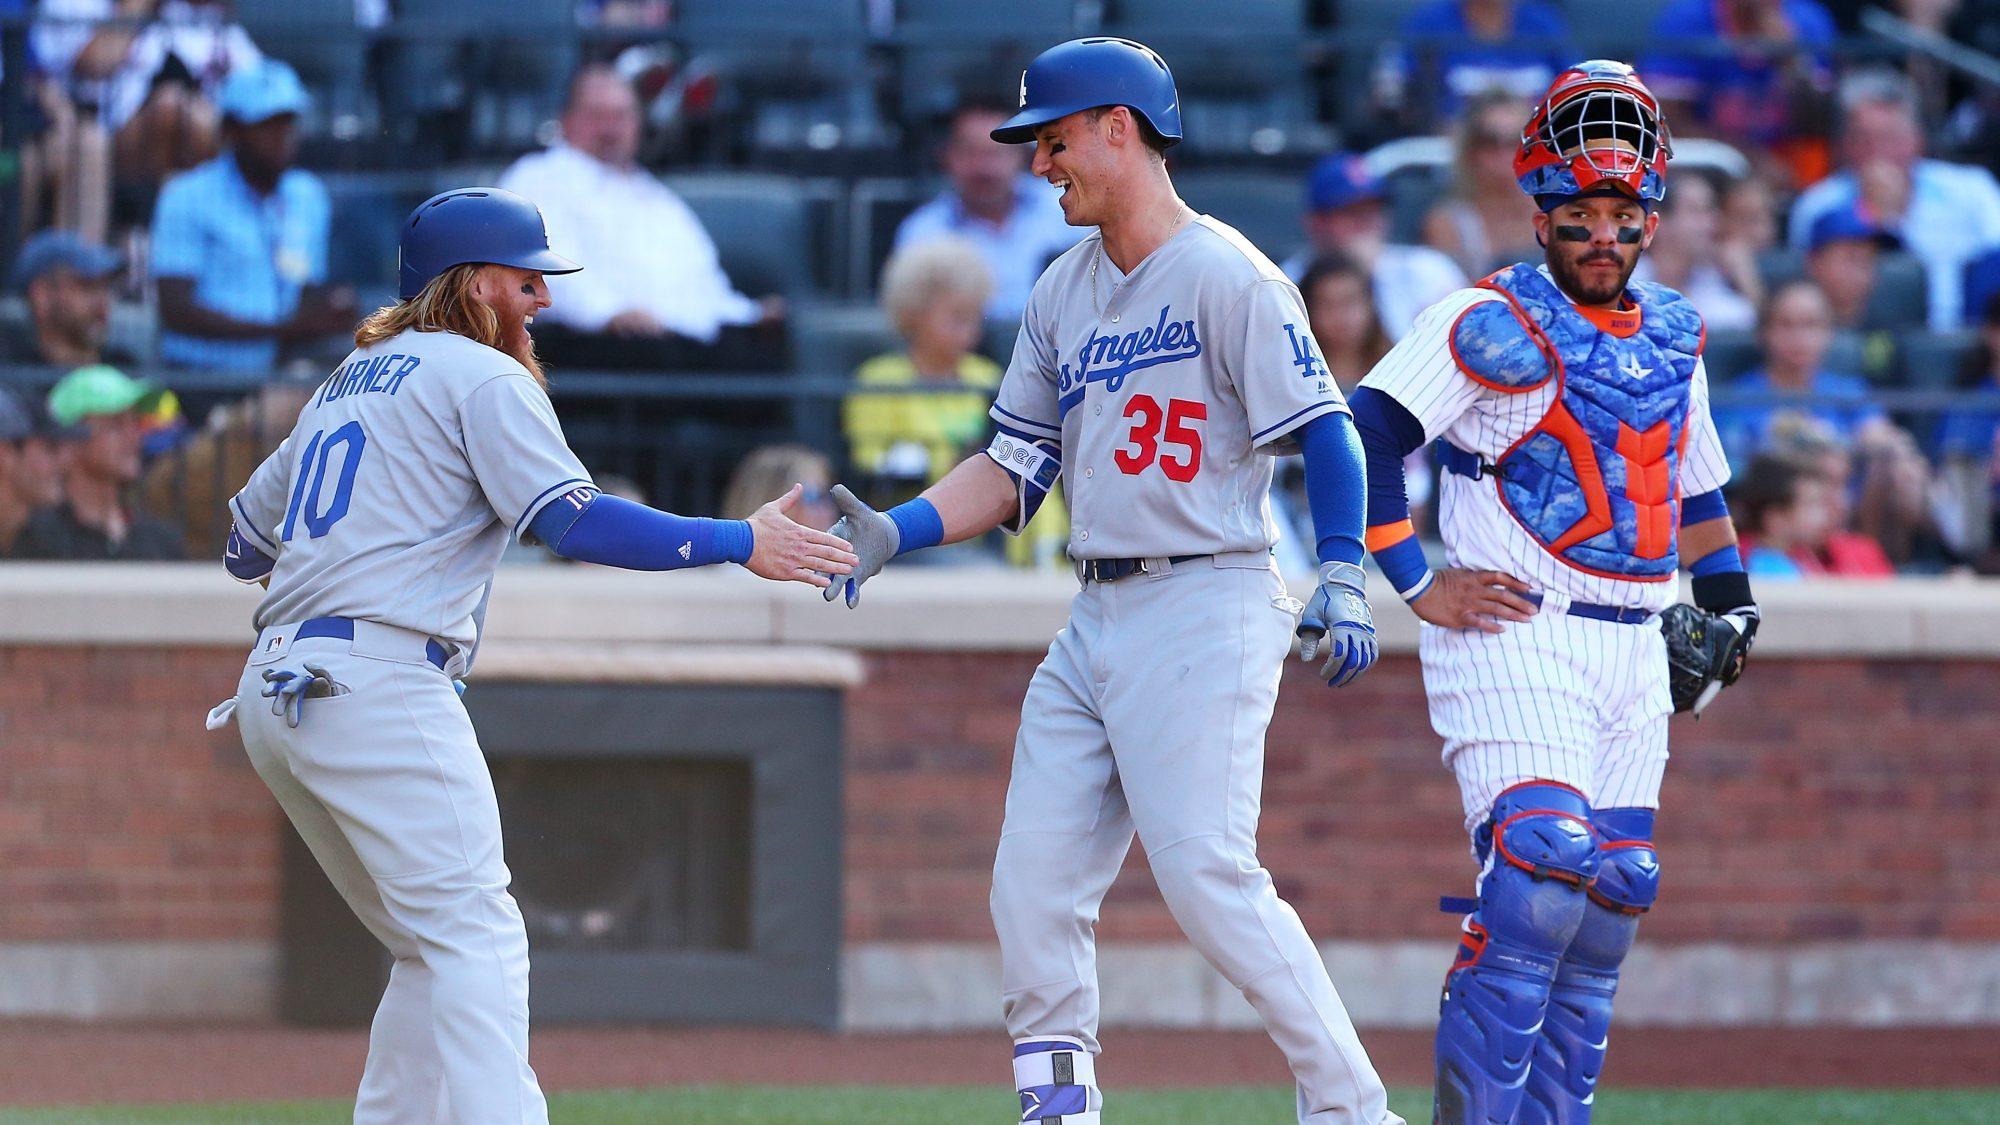 Mets Blast Three First Inning Home Runs, Still Manage To Lose 7-4